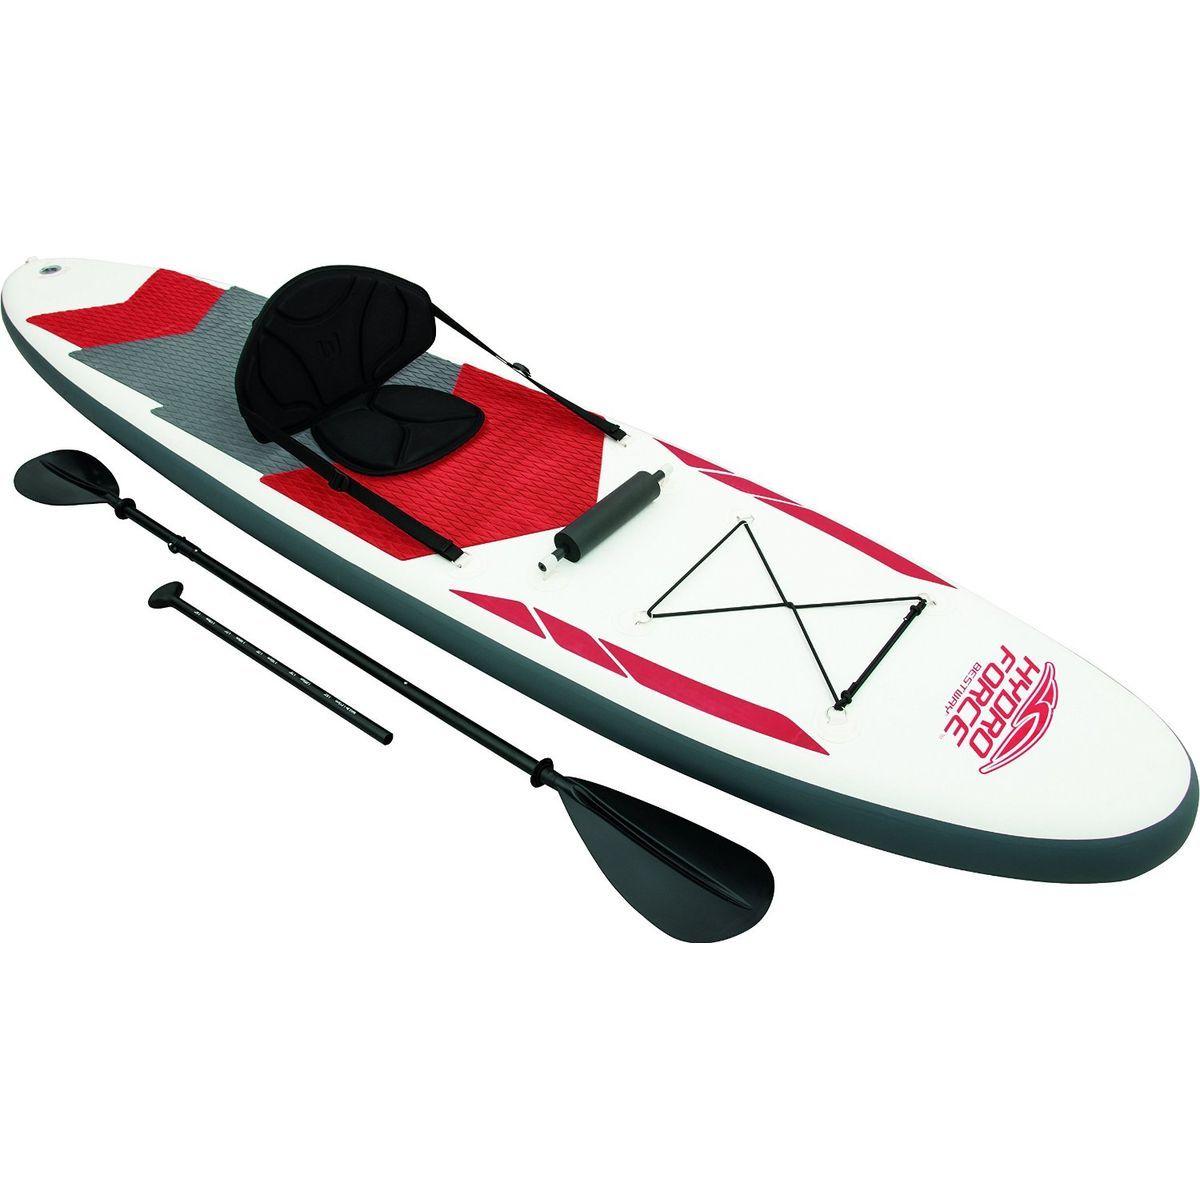 Bestway Paddleboard Long Tai SUP 335x76x15cm